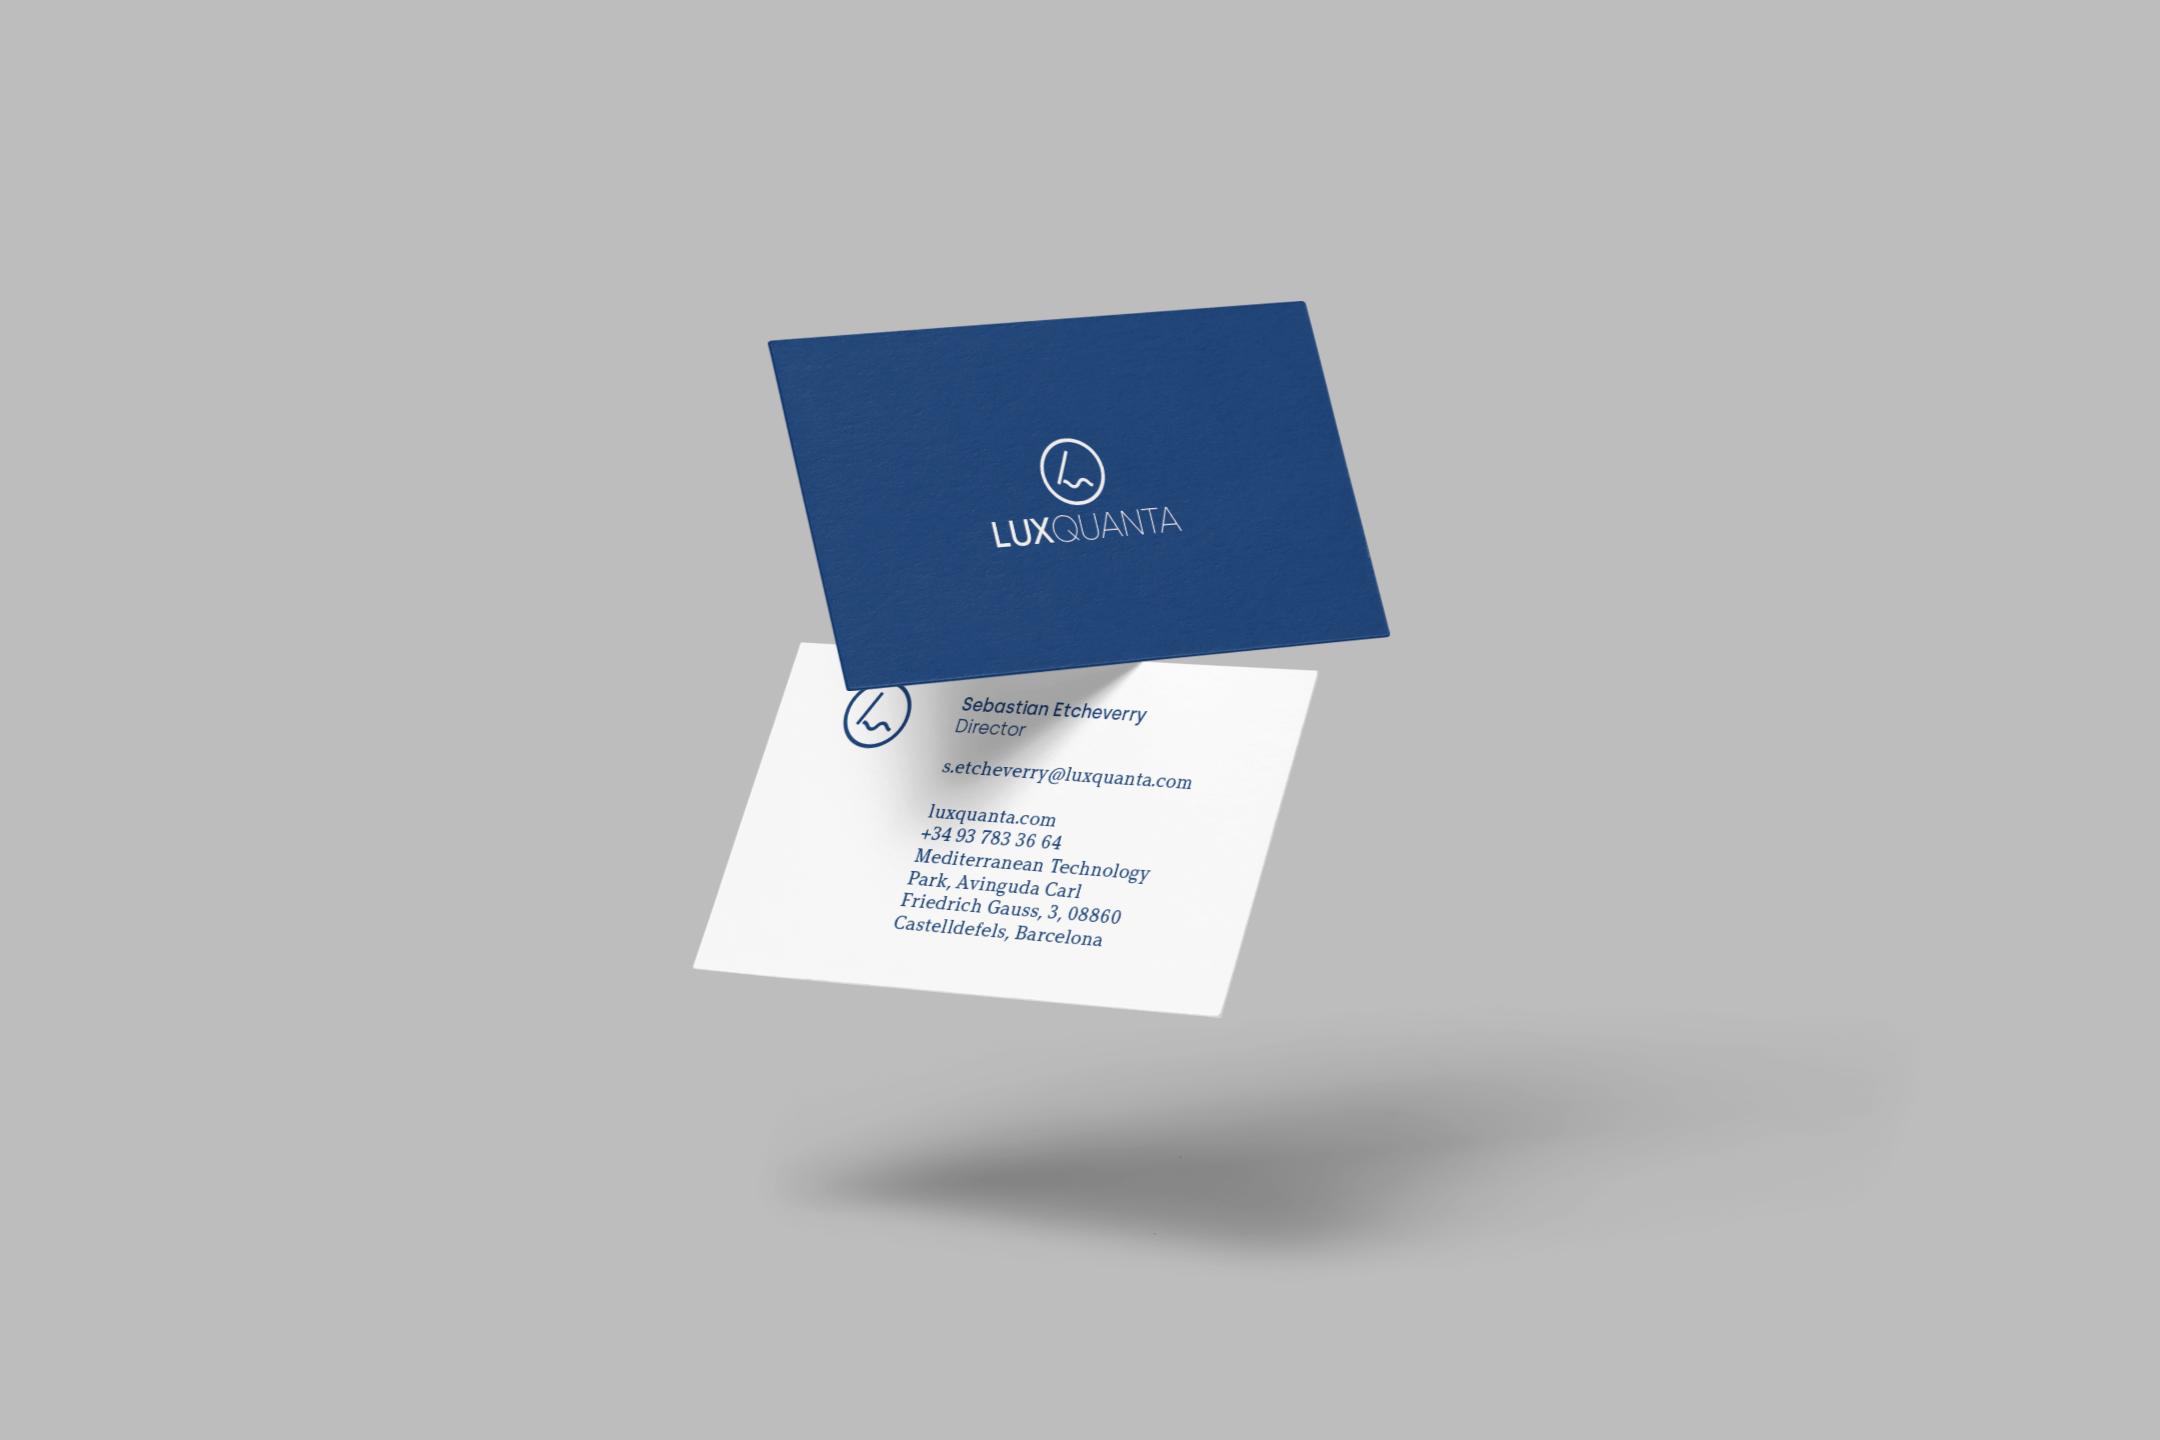 LuxQuanta-logo-design-business-card